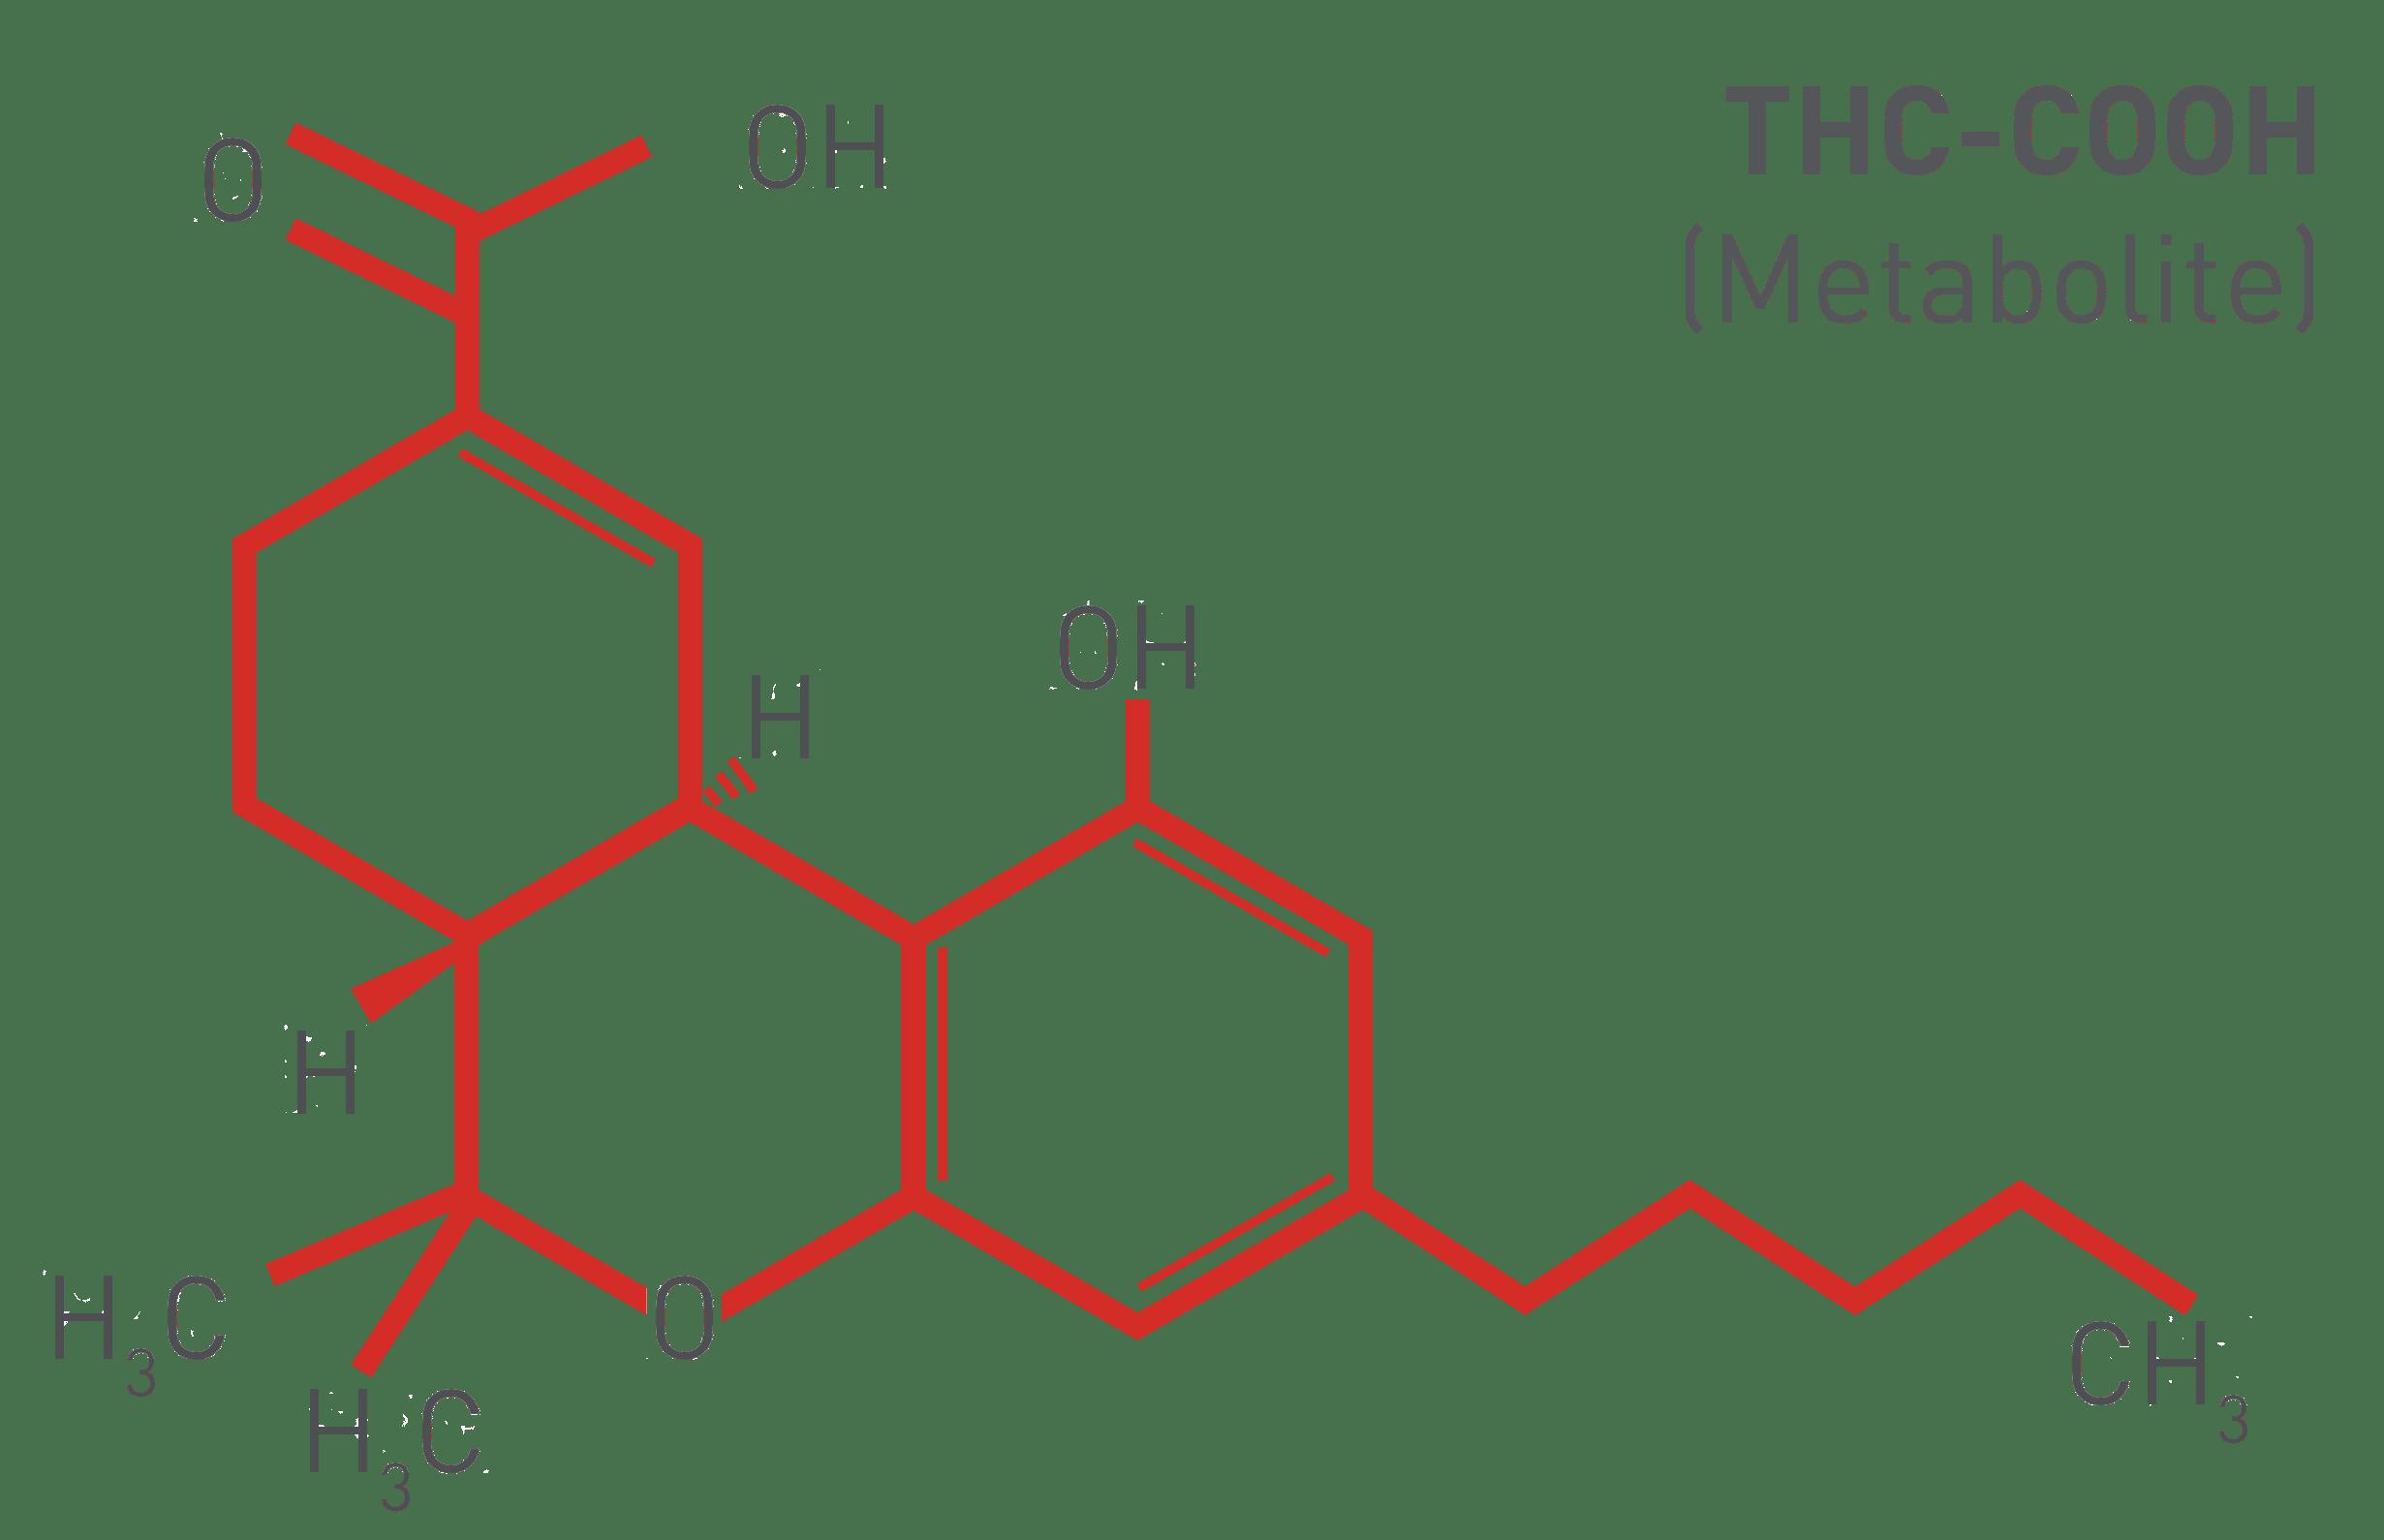 THC-COOH marijuana metabolite